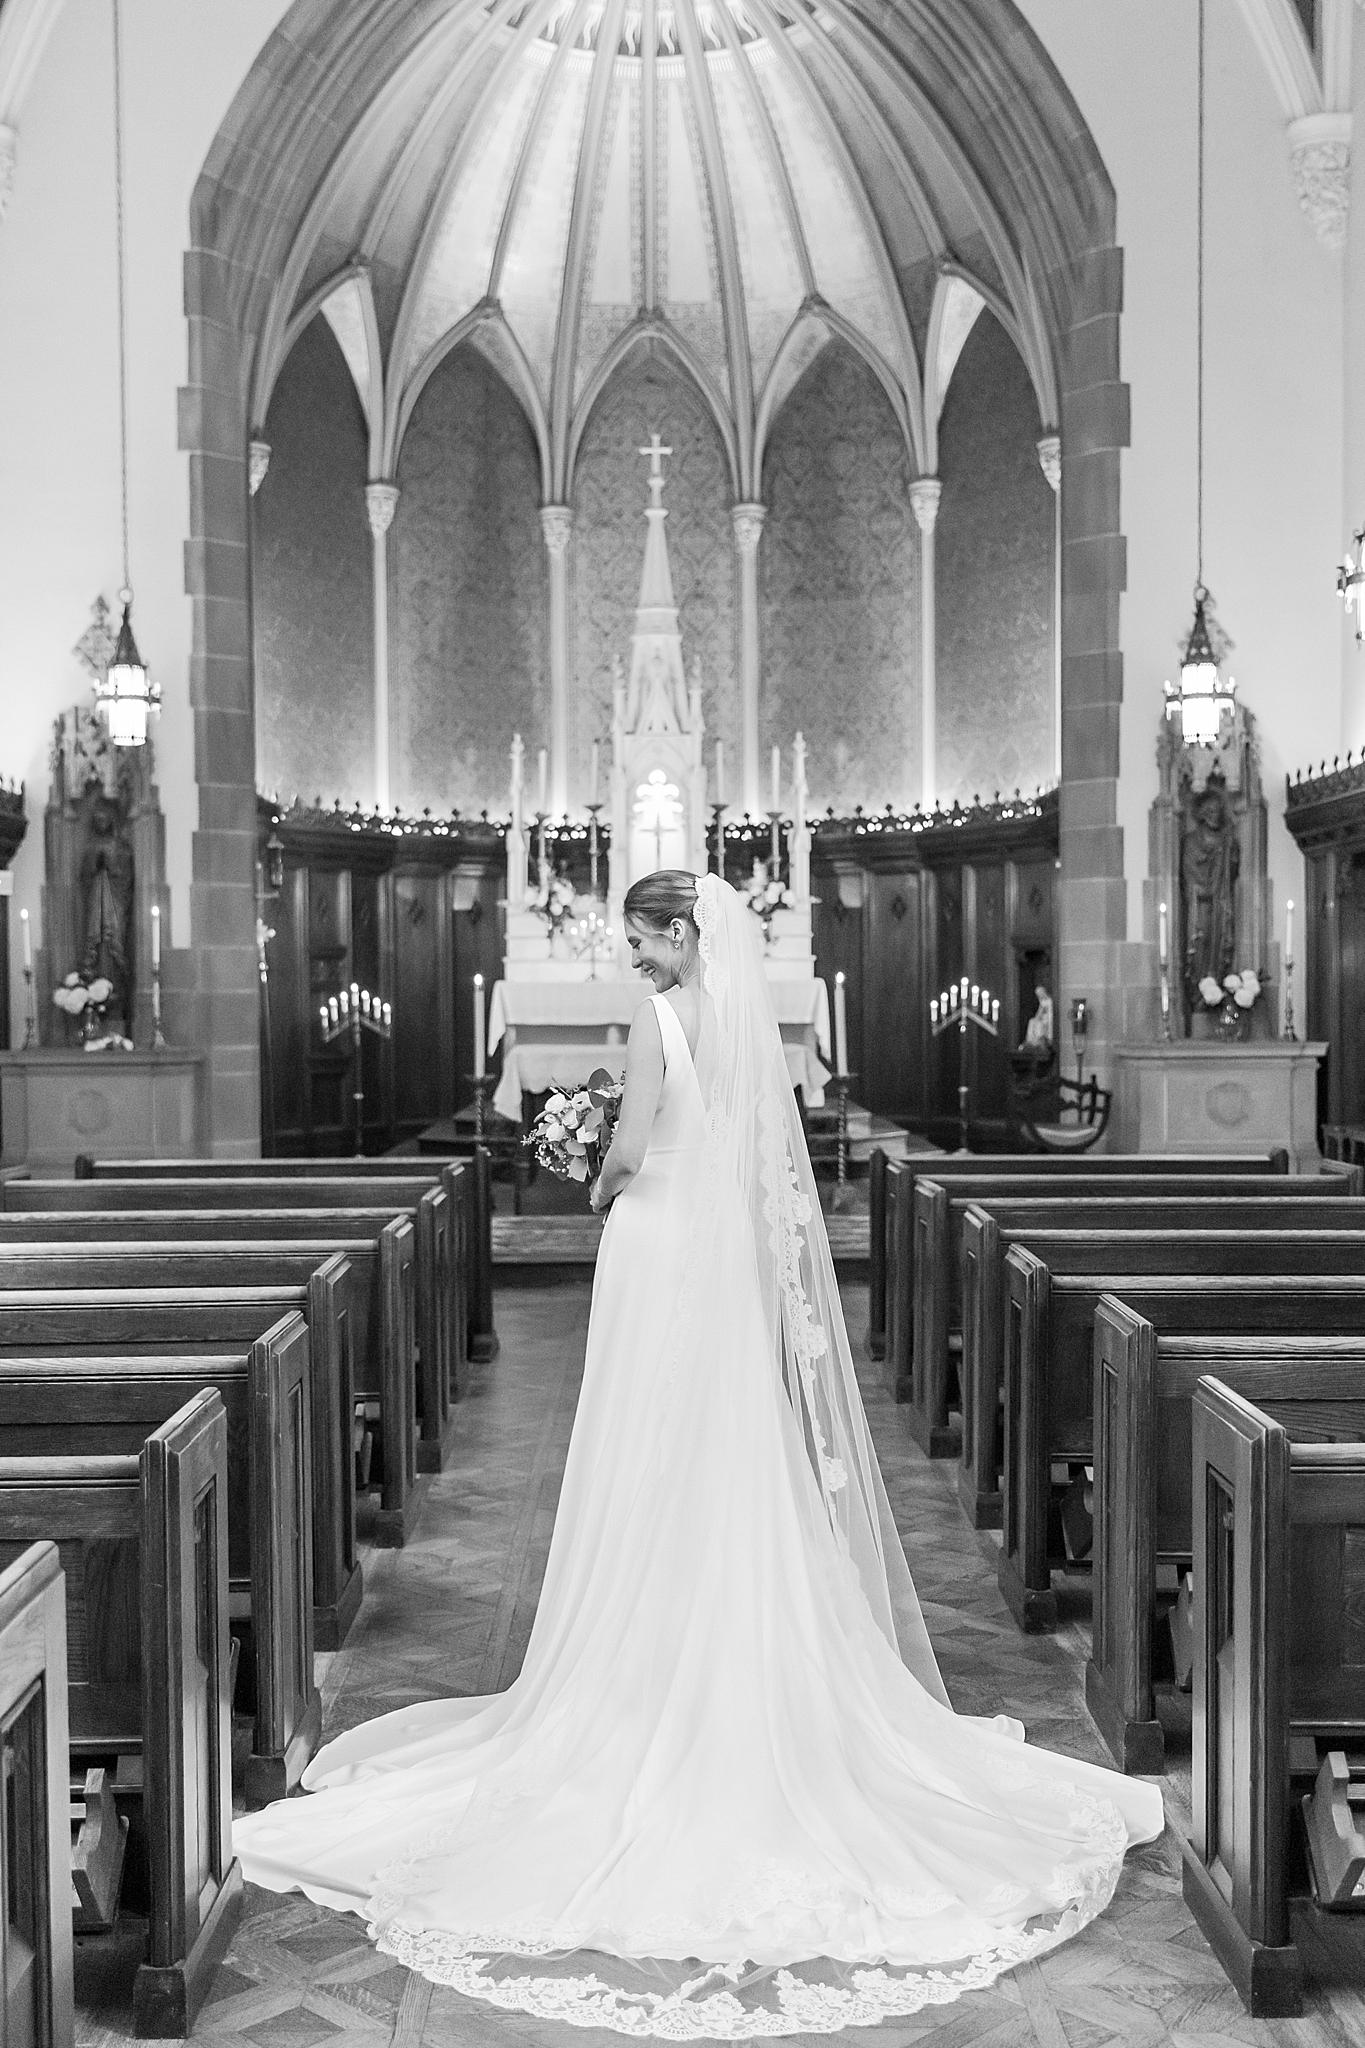 detroit-wedding-photographer-grosse-pointe-academy-chapel-detroit-golf-club-wedding-carly-matt-by-courtney-carolyn-photography_0060.jpg